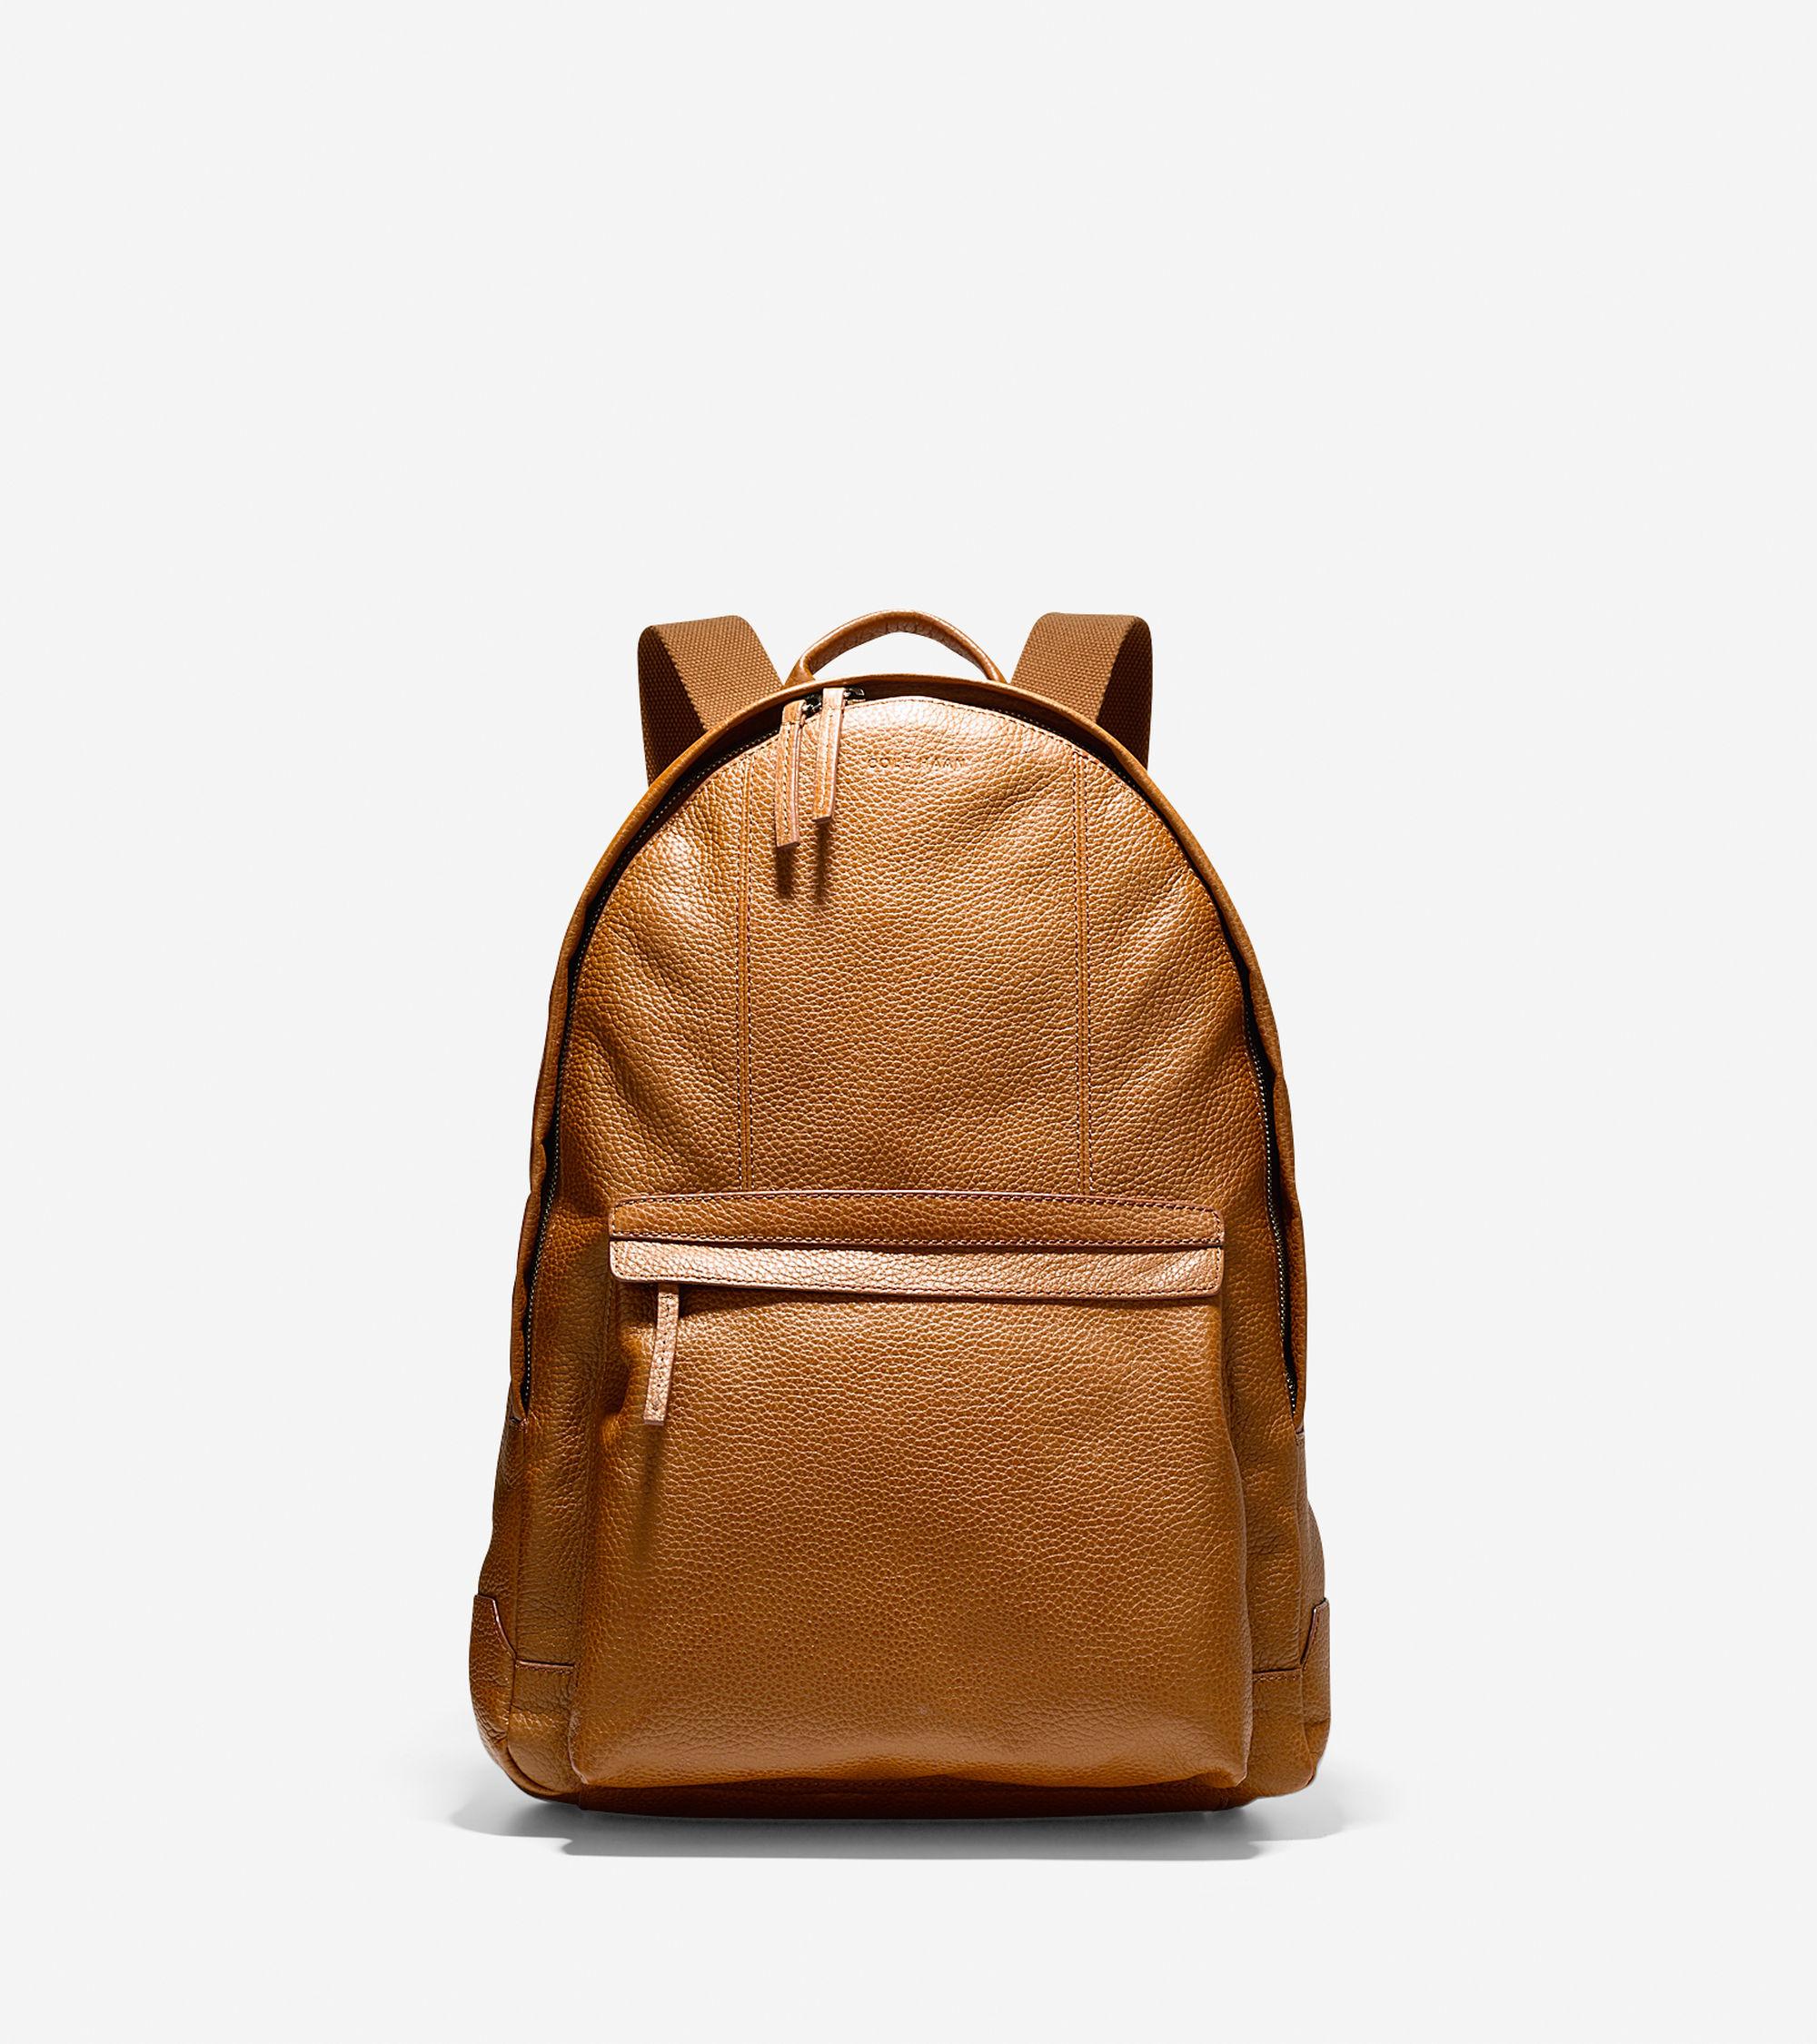 Cole haan Wayland Backpack in Brown for Men